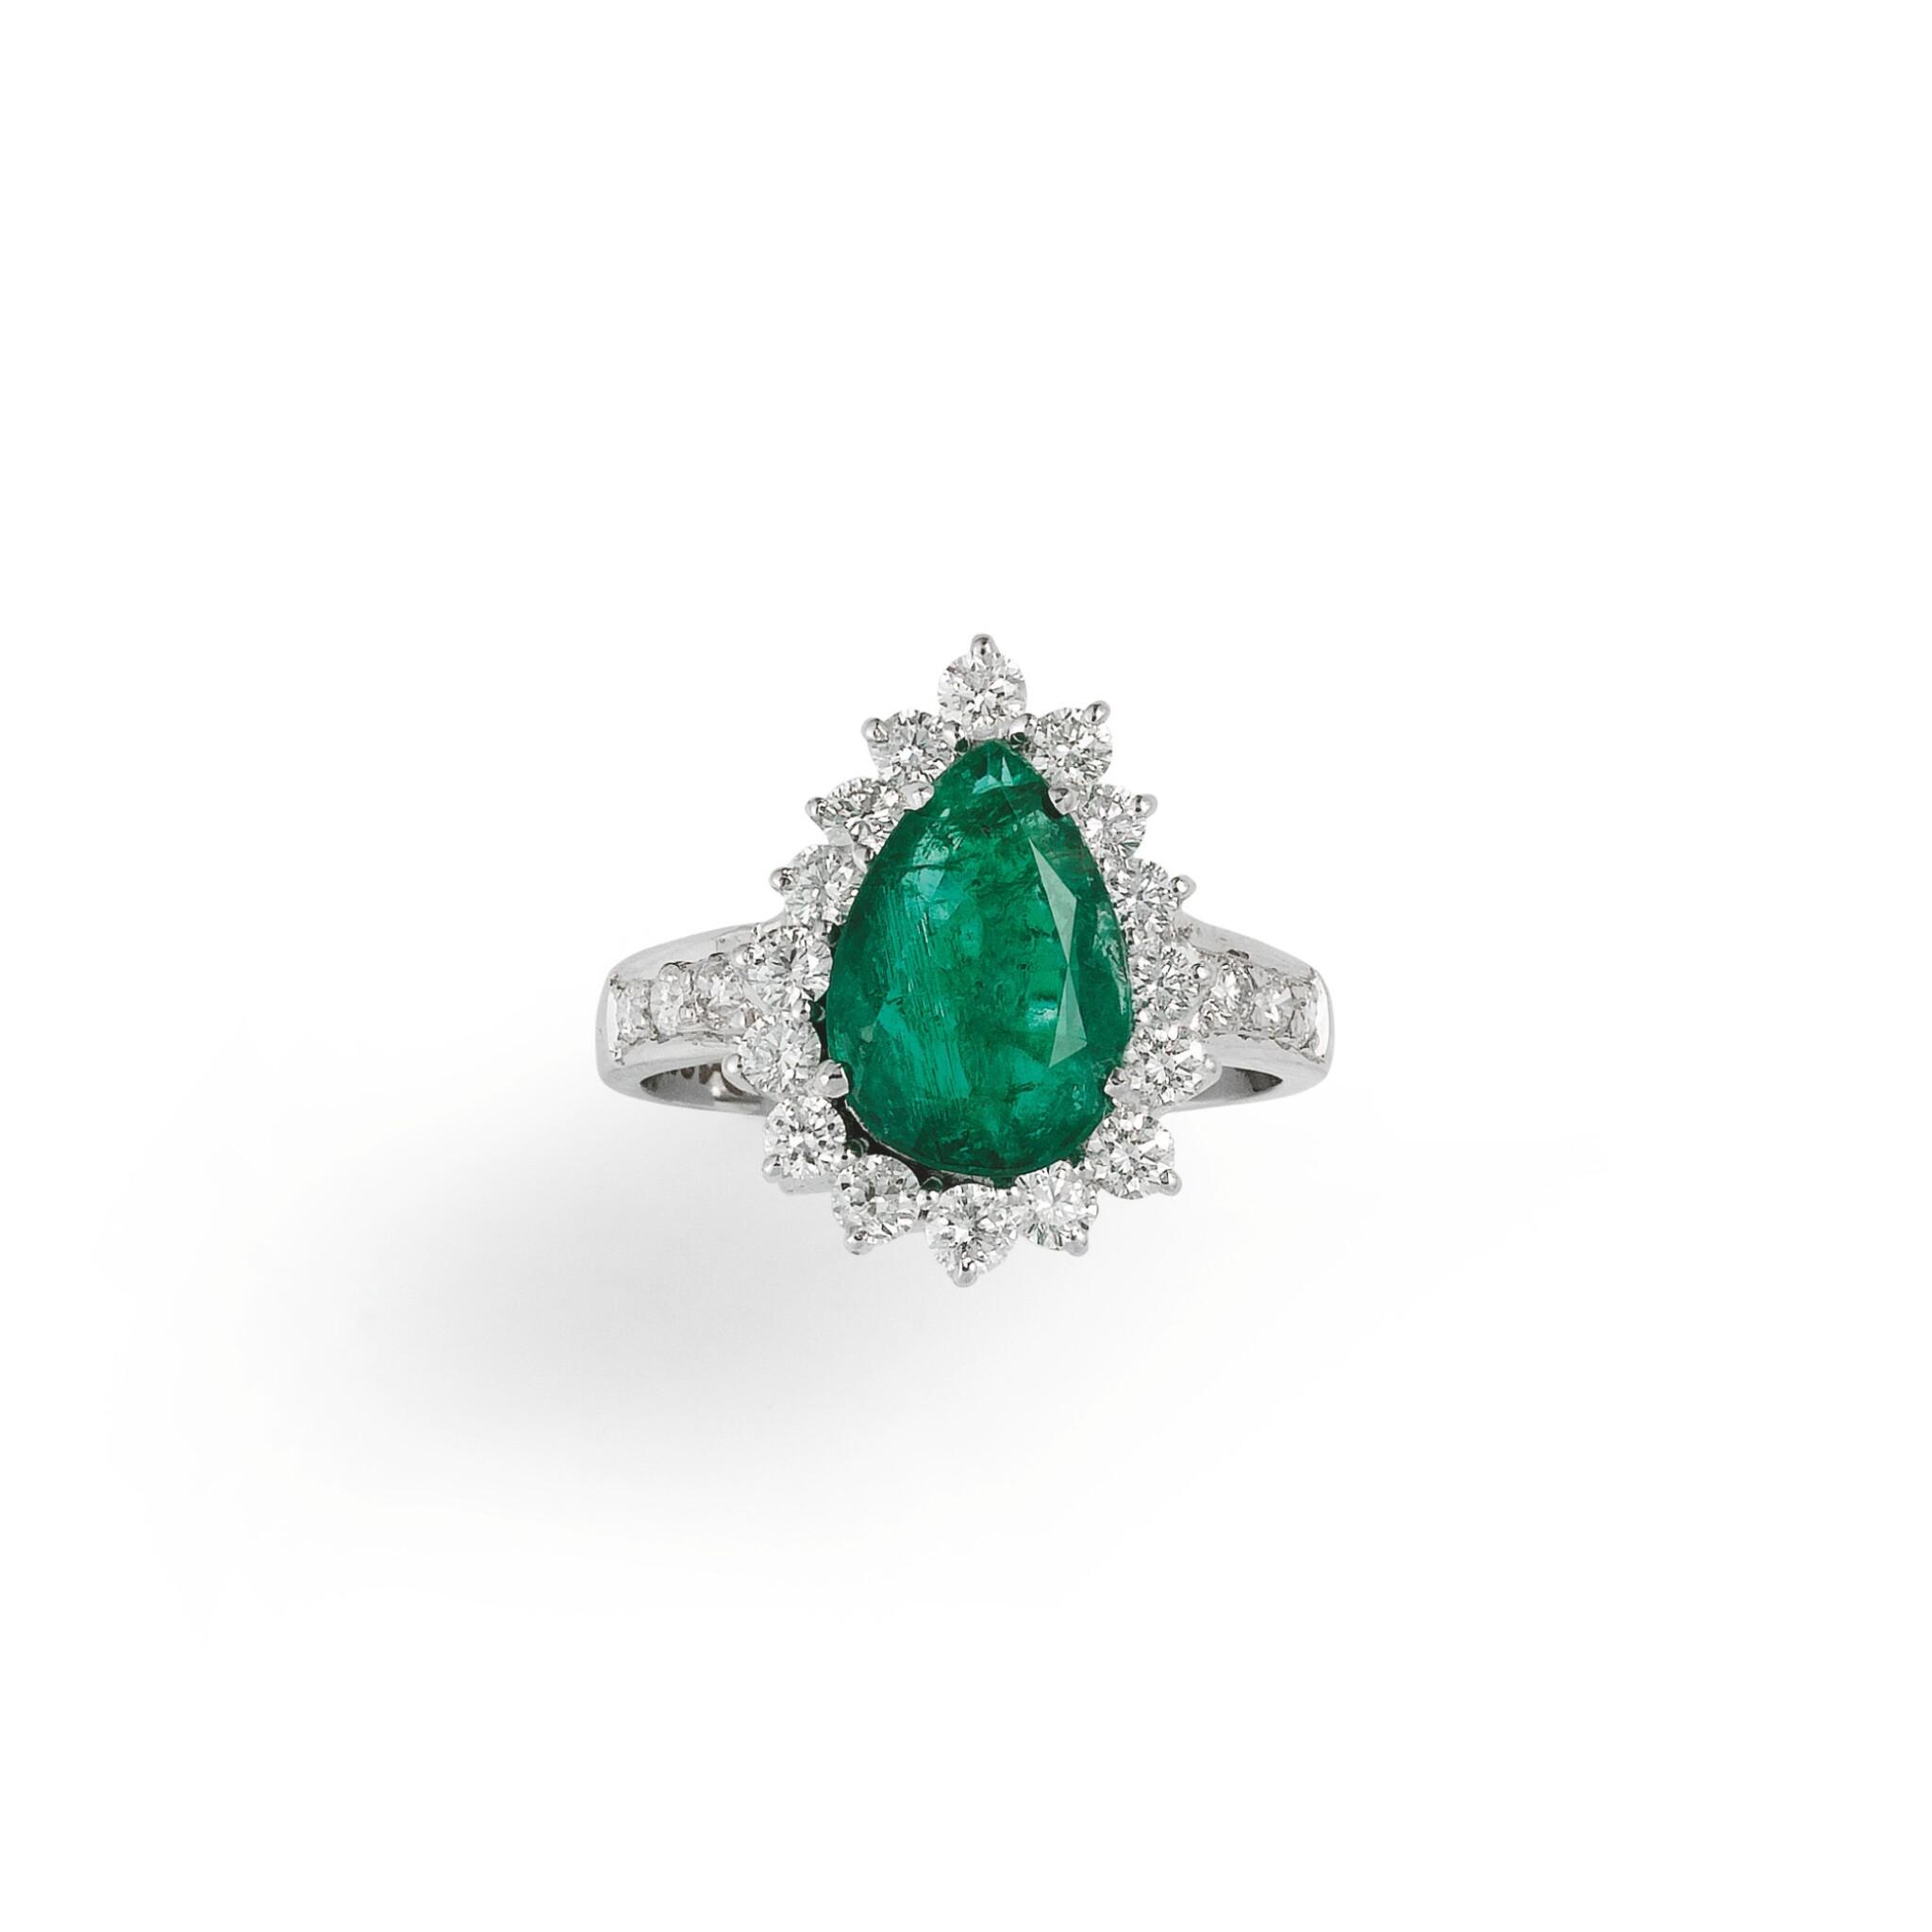 View full screen - View 1 of Lot 88. Emerald and diamond ring [Bague émeraude et diamants].